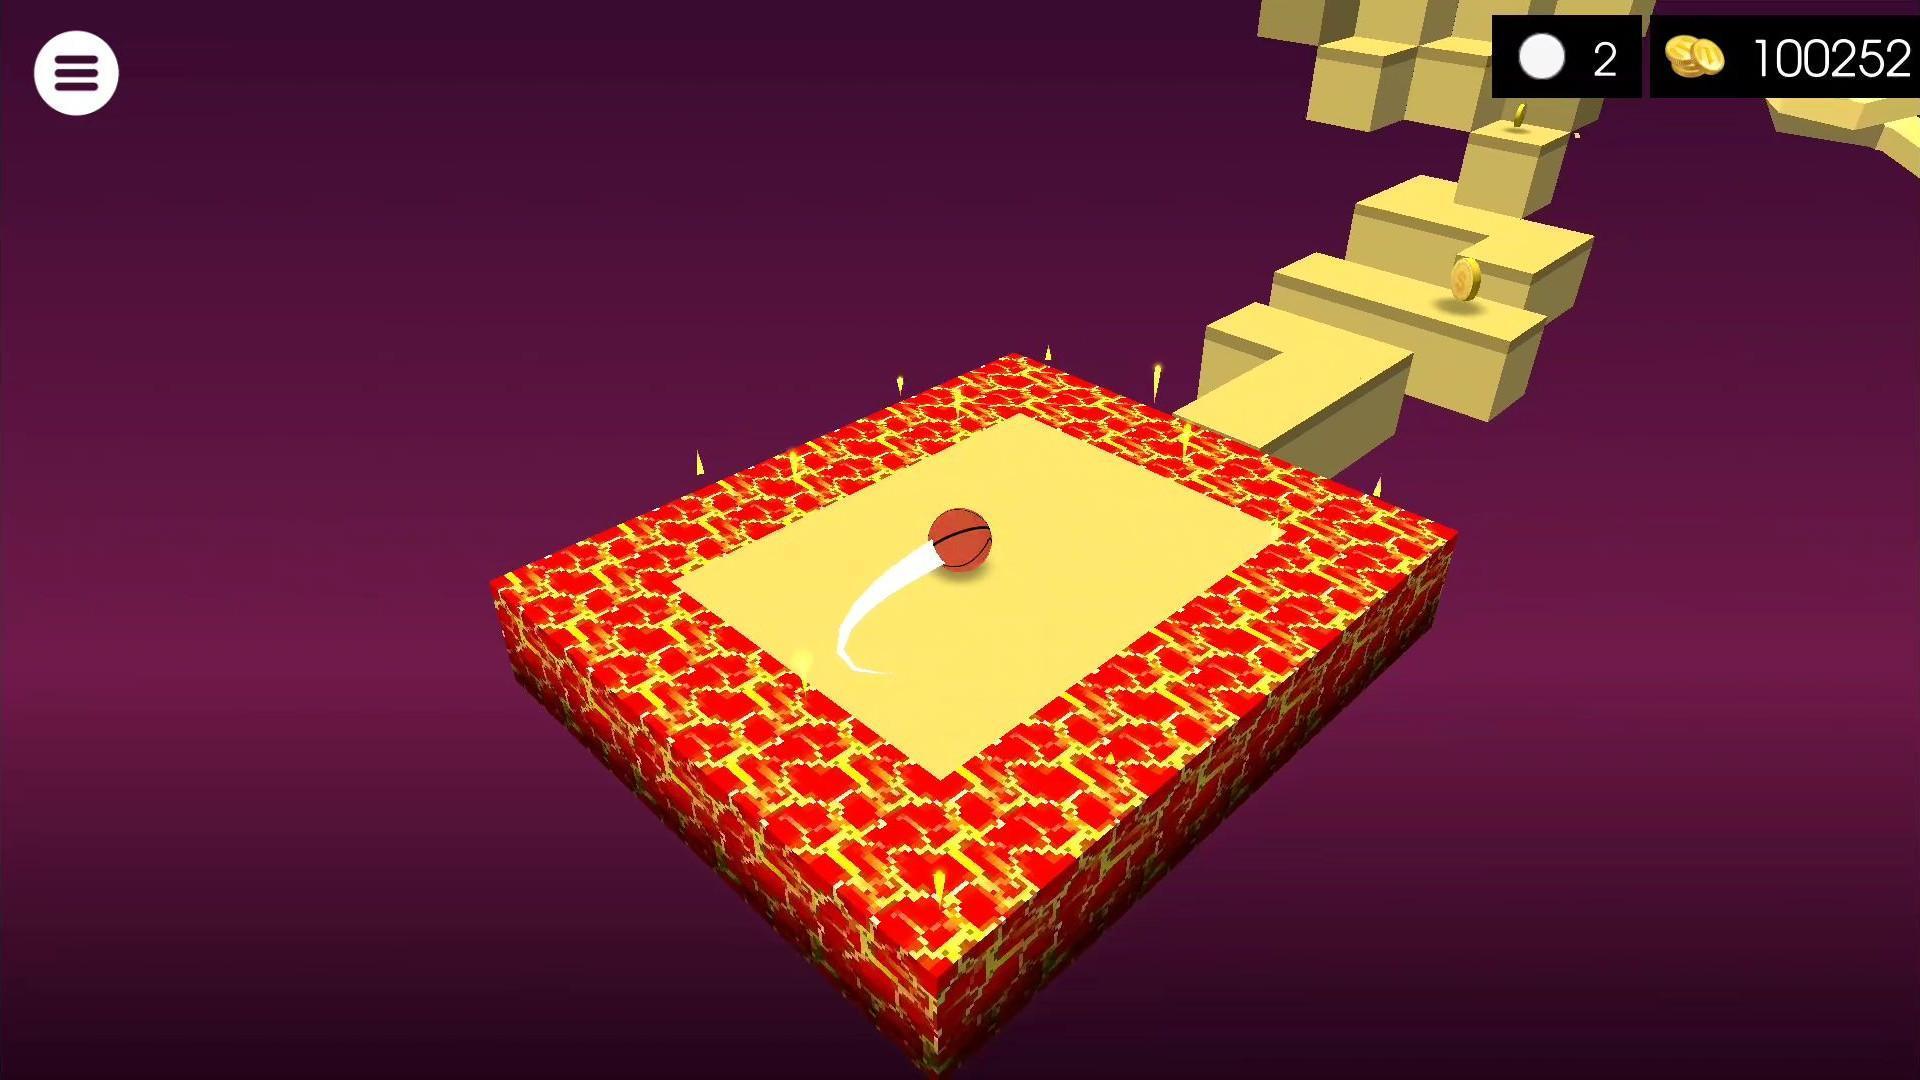 RYWO free 3D roll ball game 1.2.3 Screenshot 14